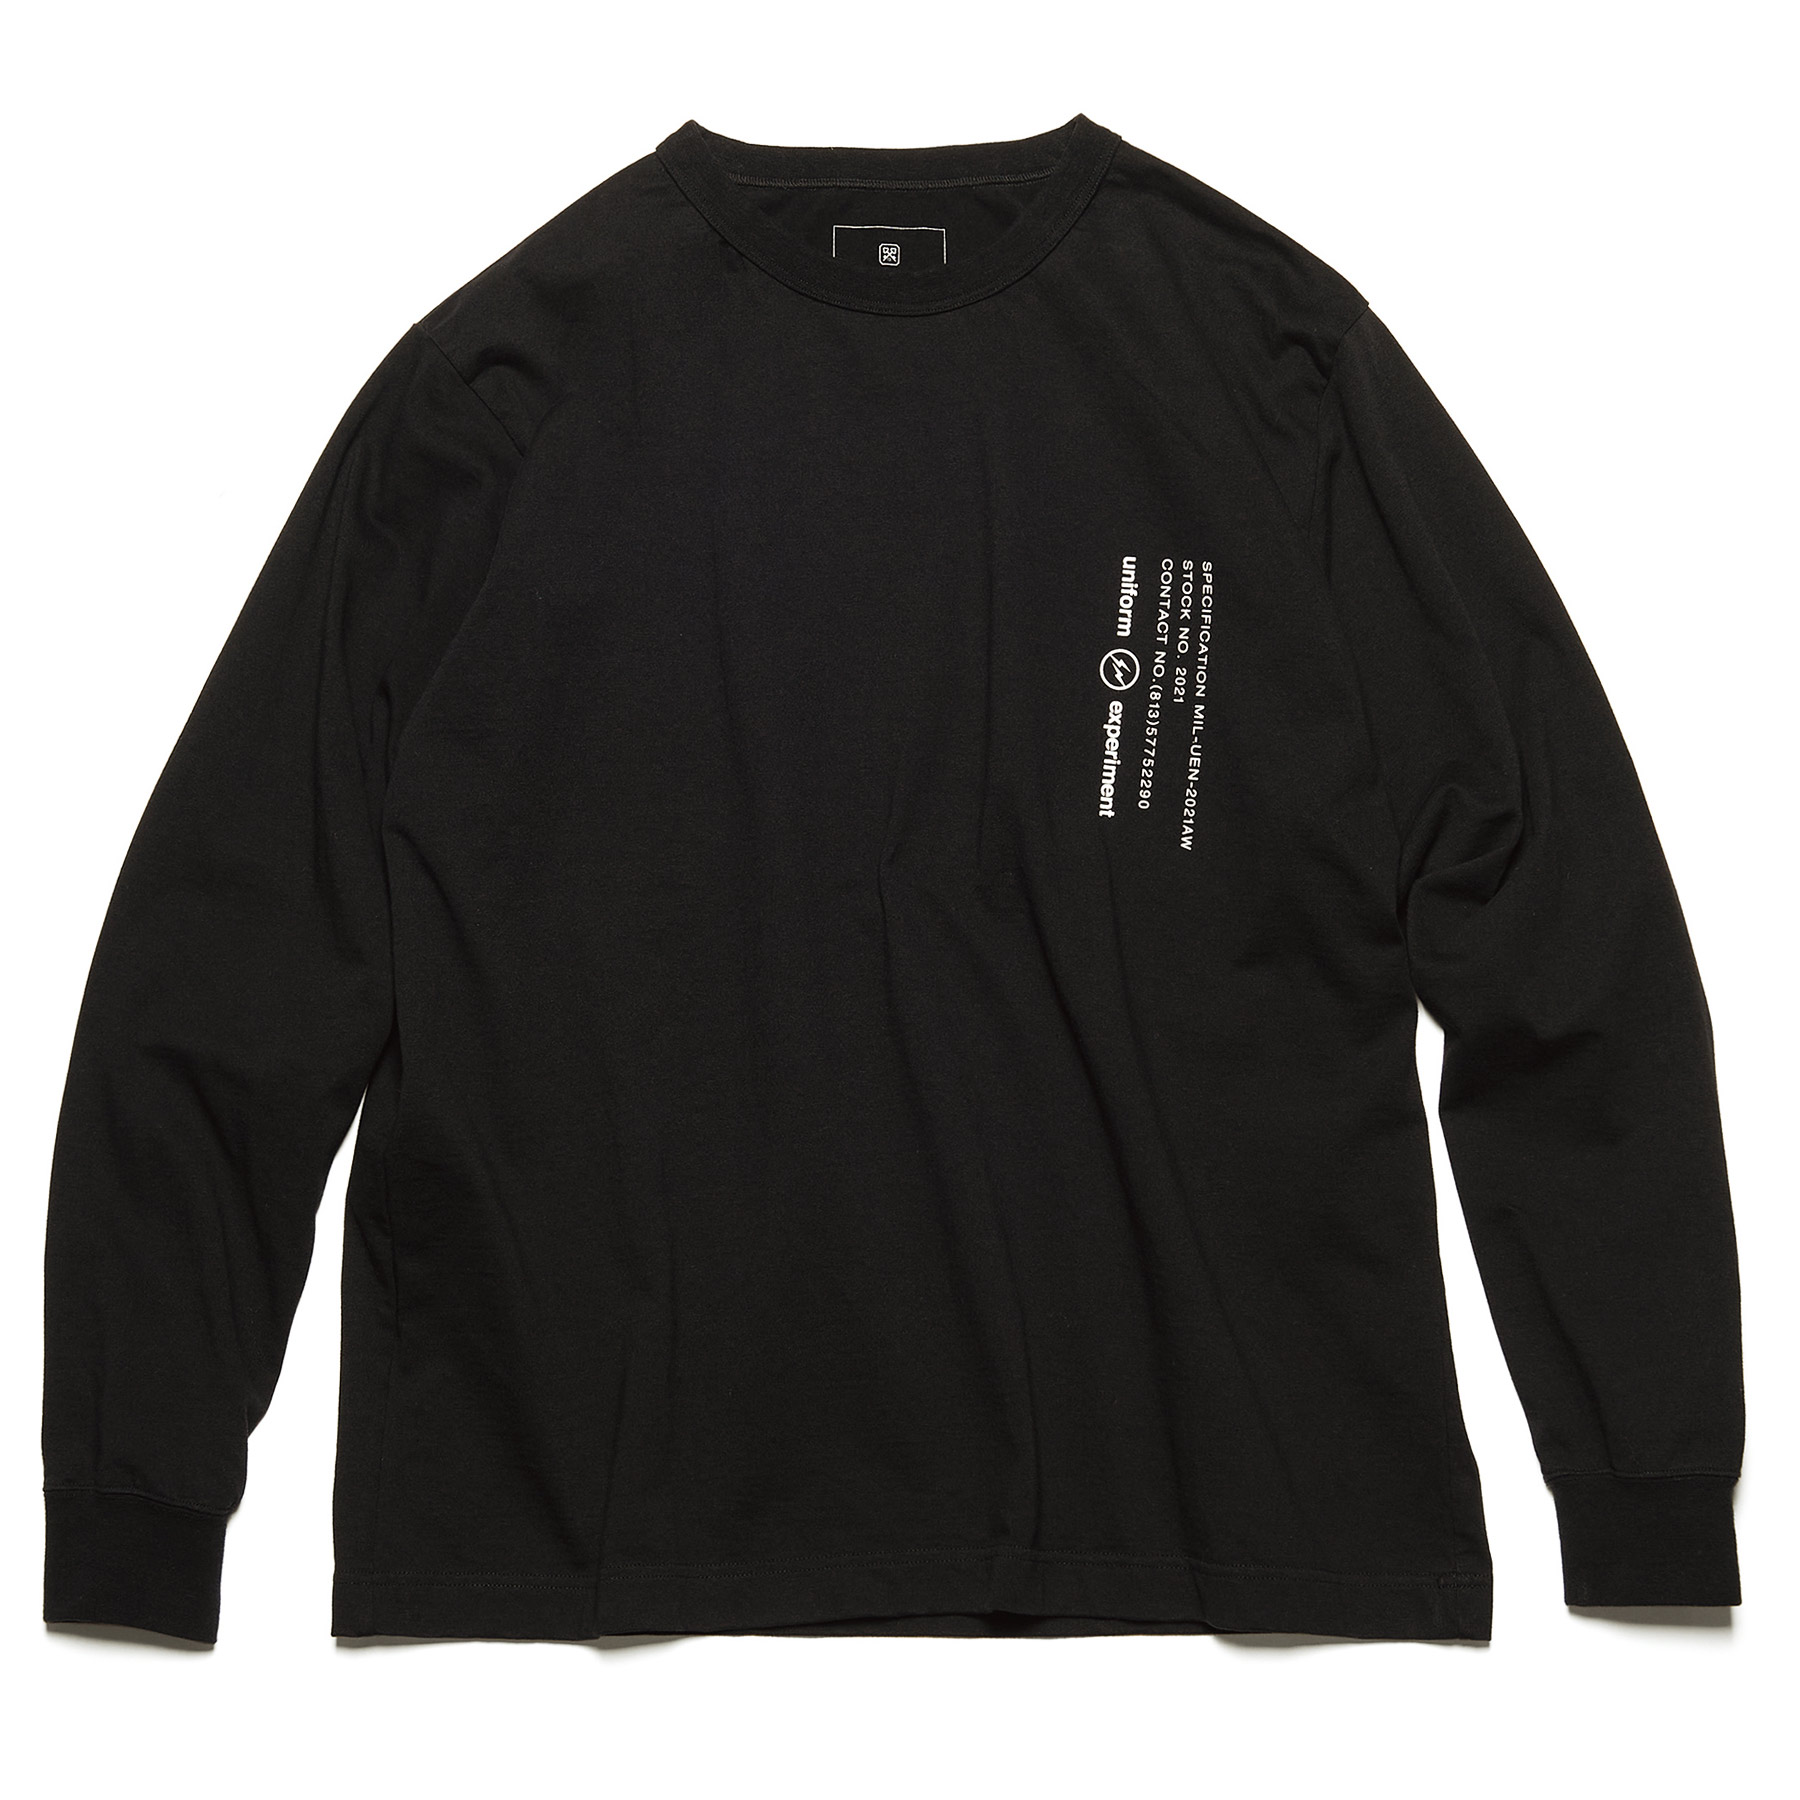 uniform experiment / L/S WIDE MIL TEE (Black)